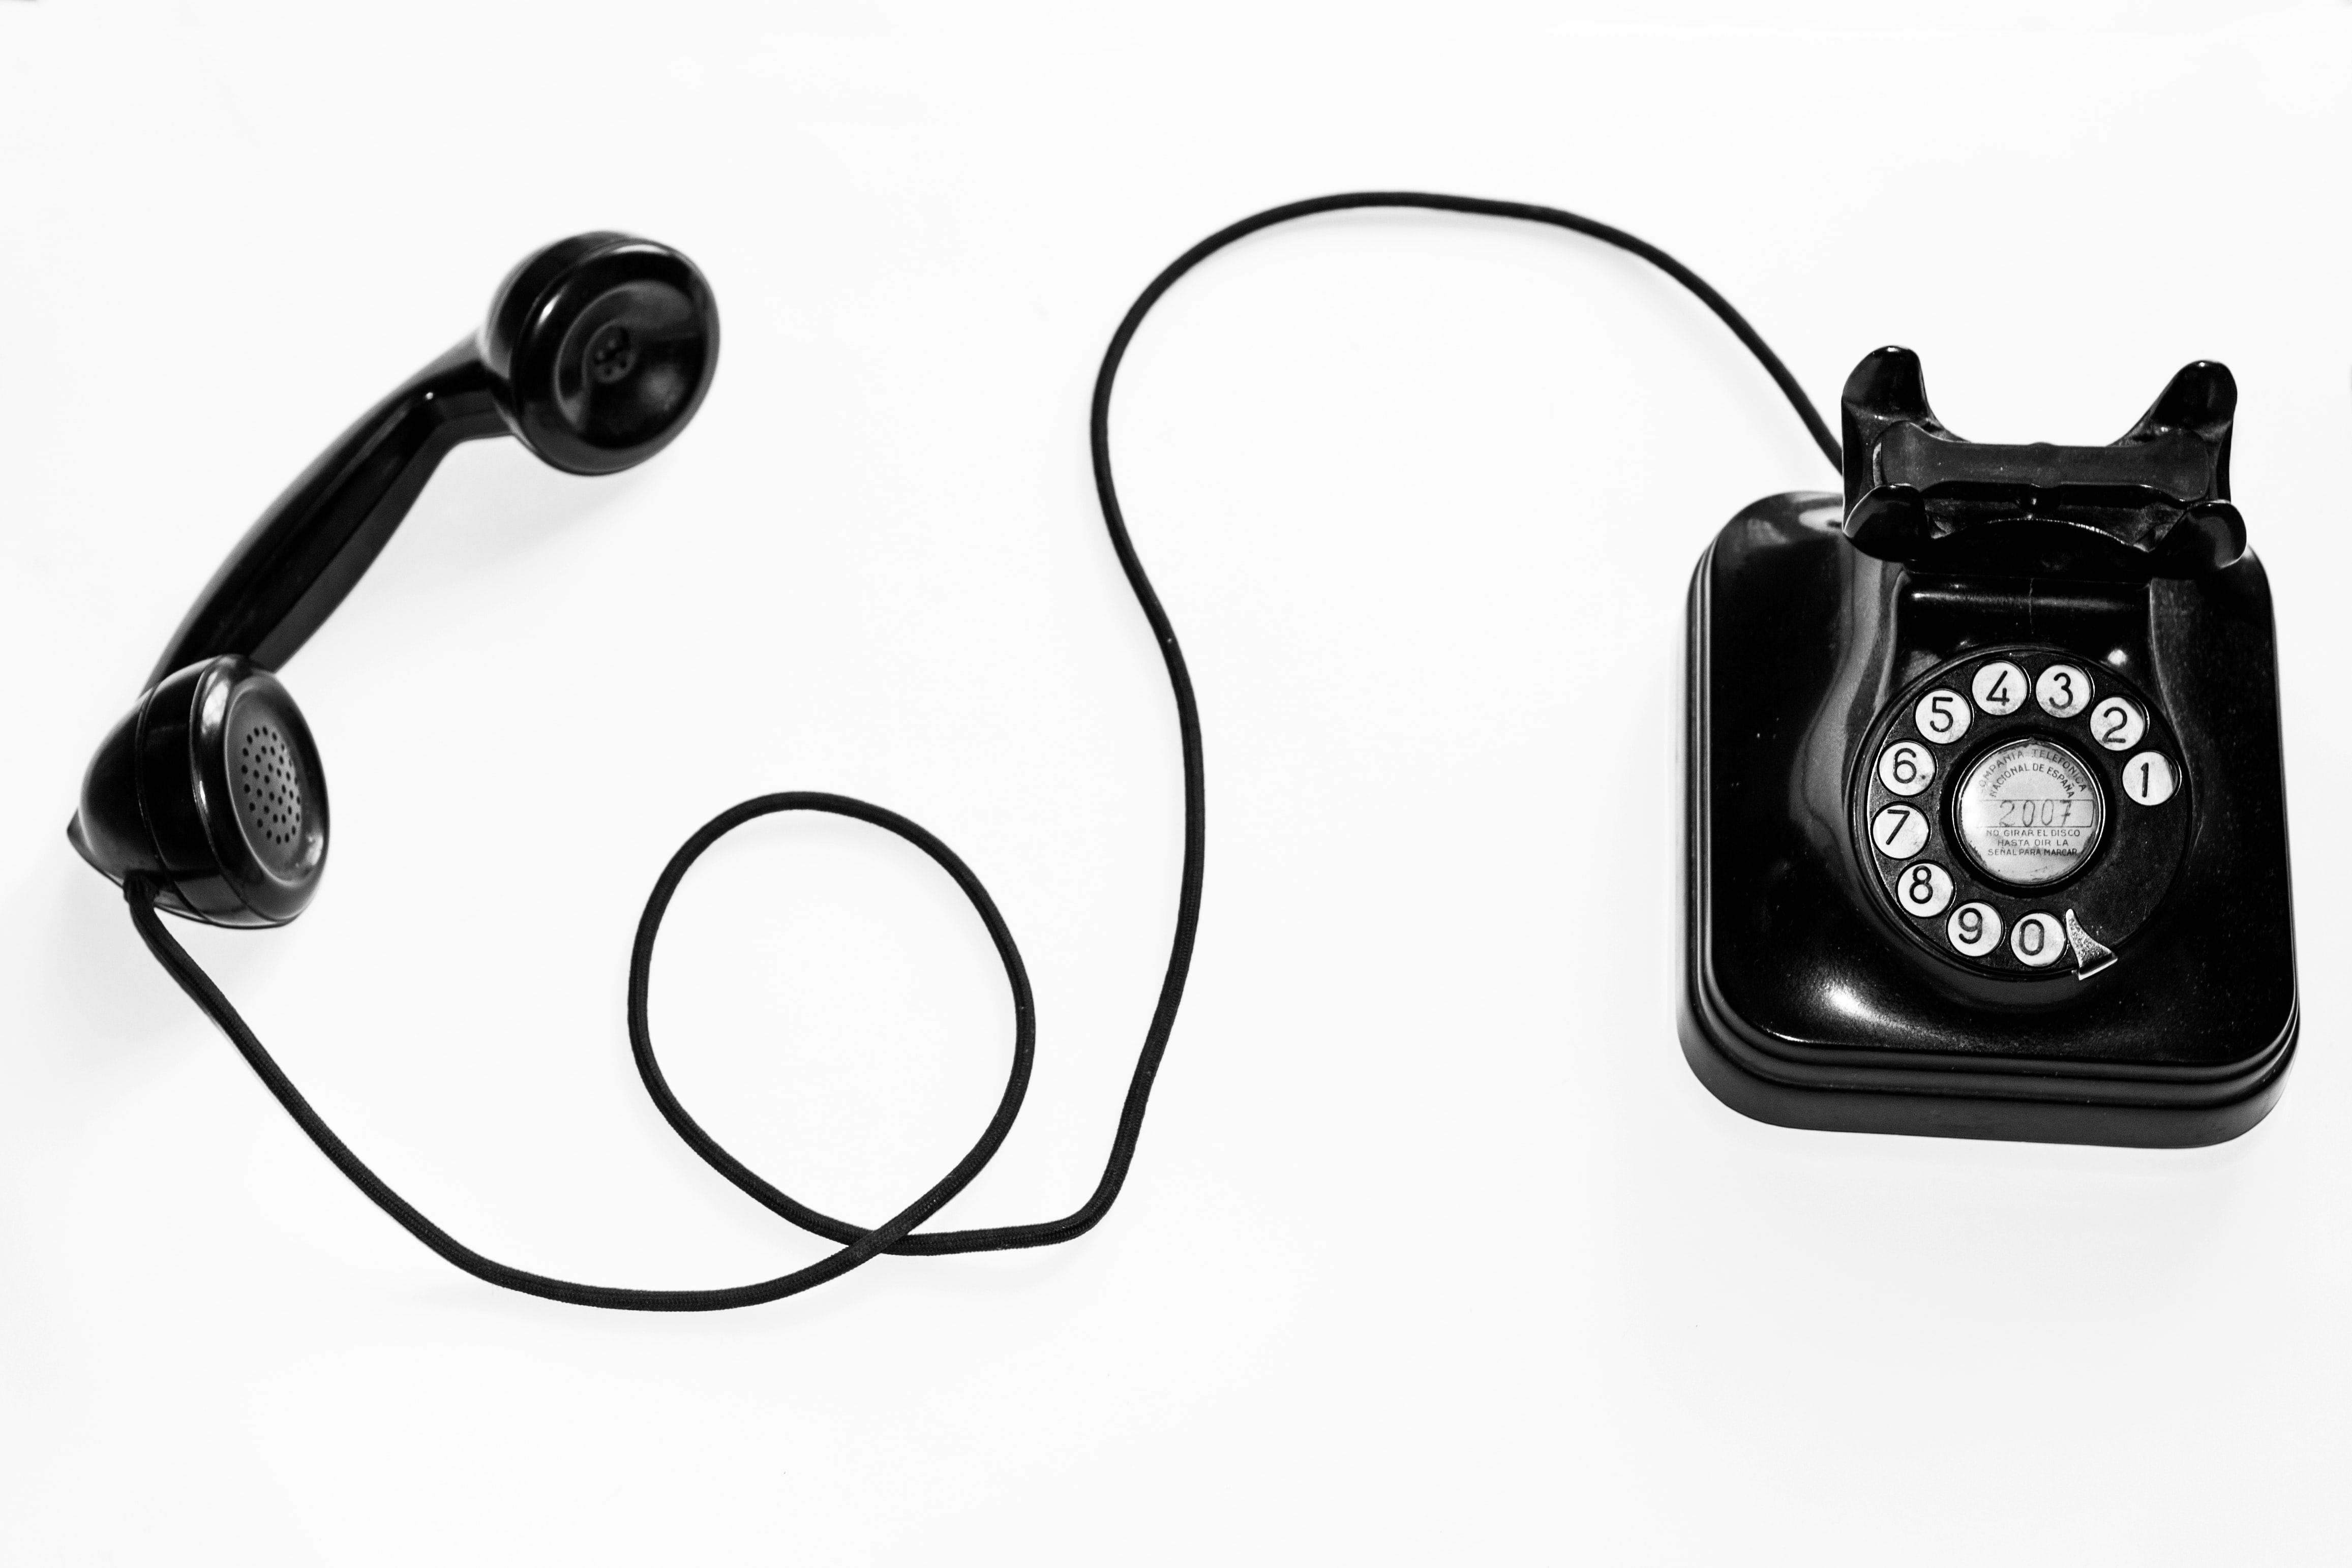 photo of black rotary phone against white background